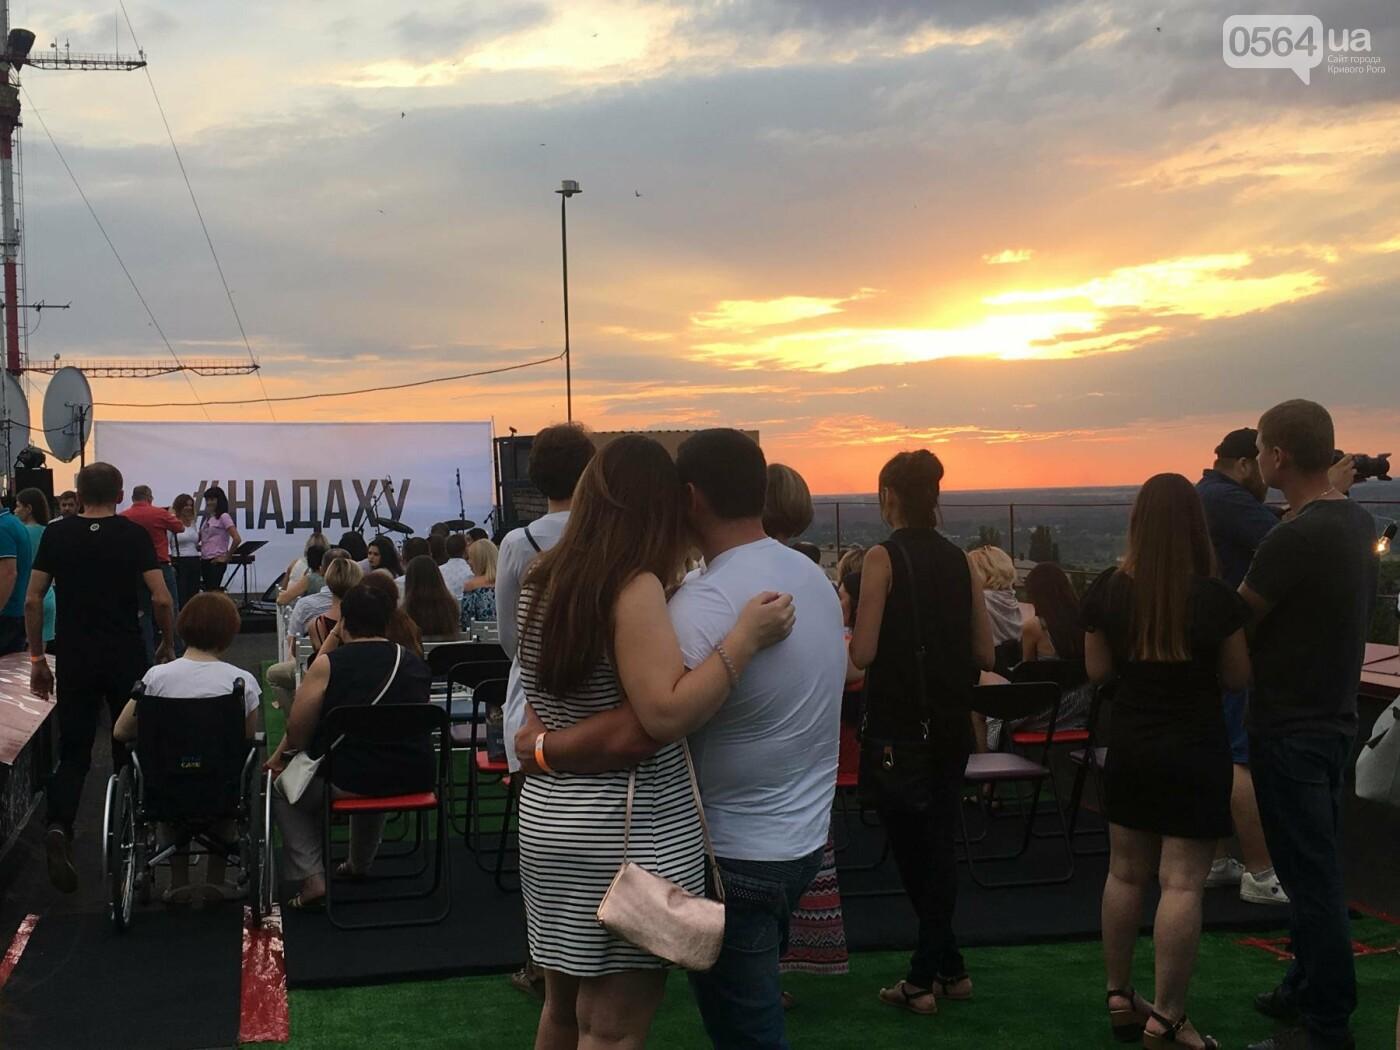 Сотни криворожан встречали закат на крыше отеля под мелодии джаза, - ФОТО, ВИДЕО, фото-23